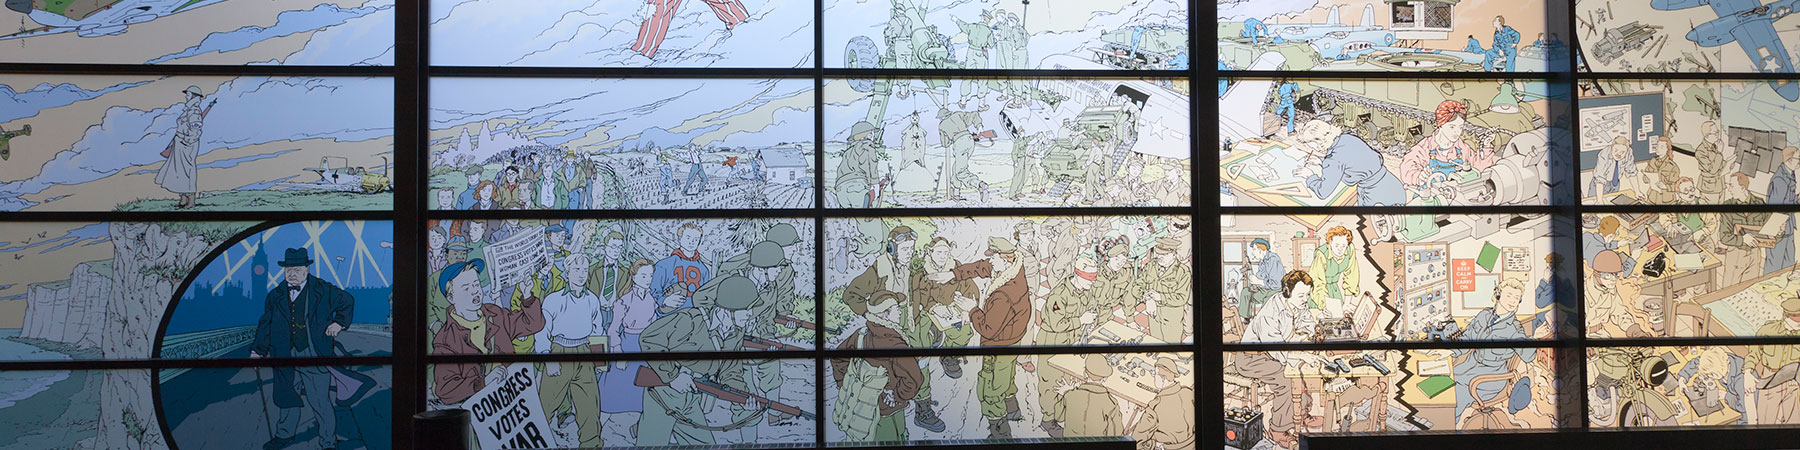 oorlogsmuseum-overloon8